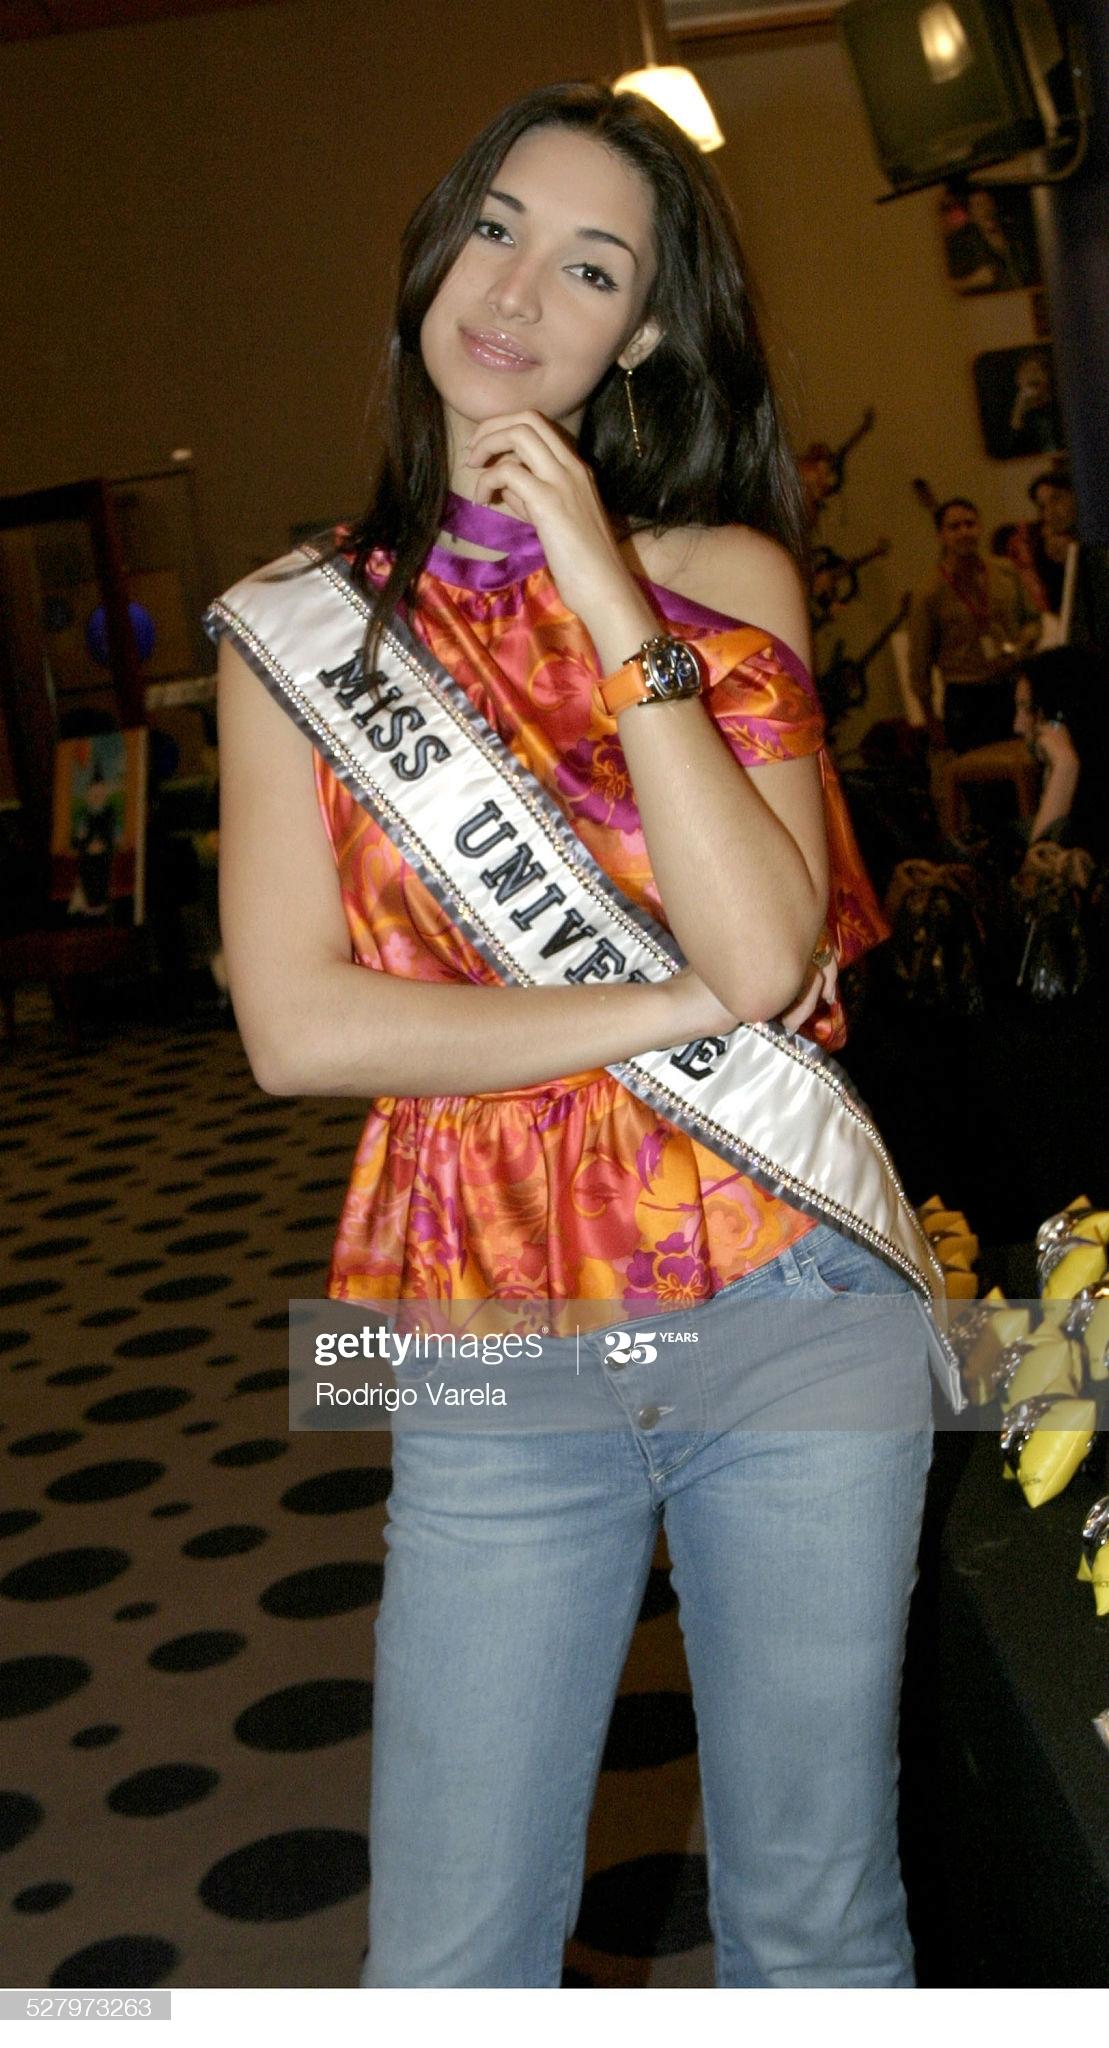 ════ ∘◦❁◦∘ ════ Amelia Vega, Miss Universe 2003. ════ ∘◦❁◦∘ ════ - Página 12 Miss-u54